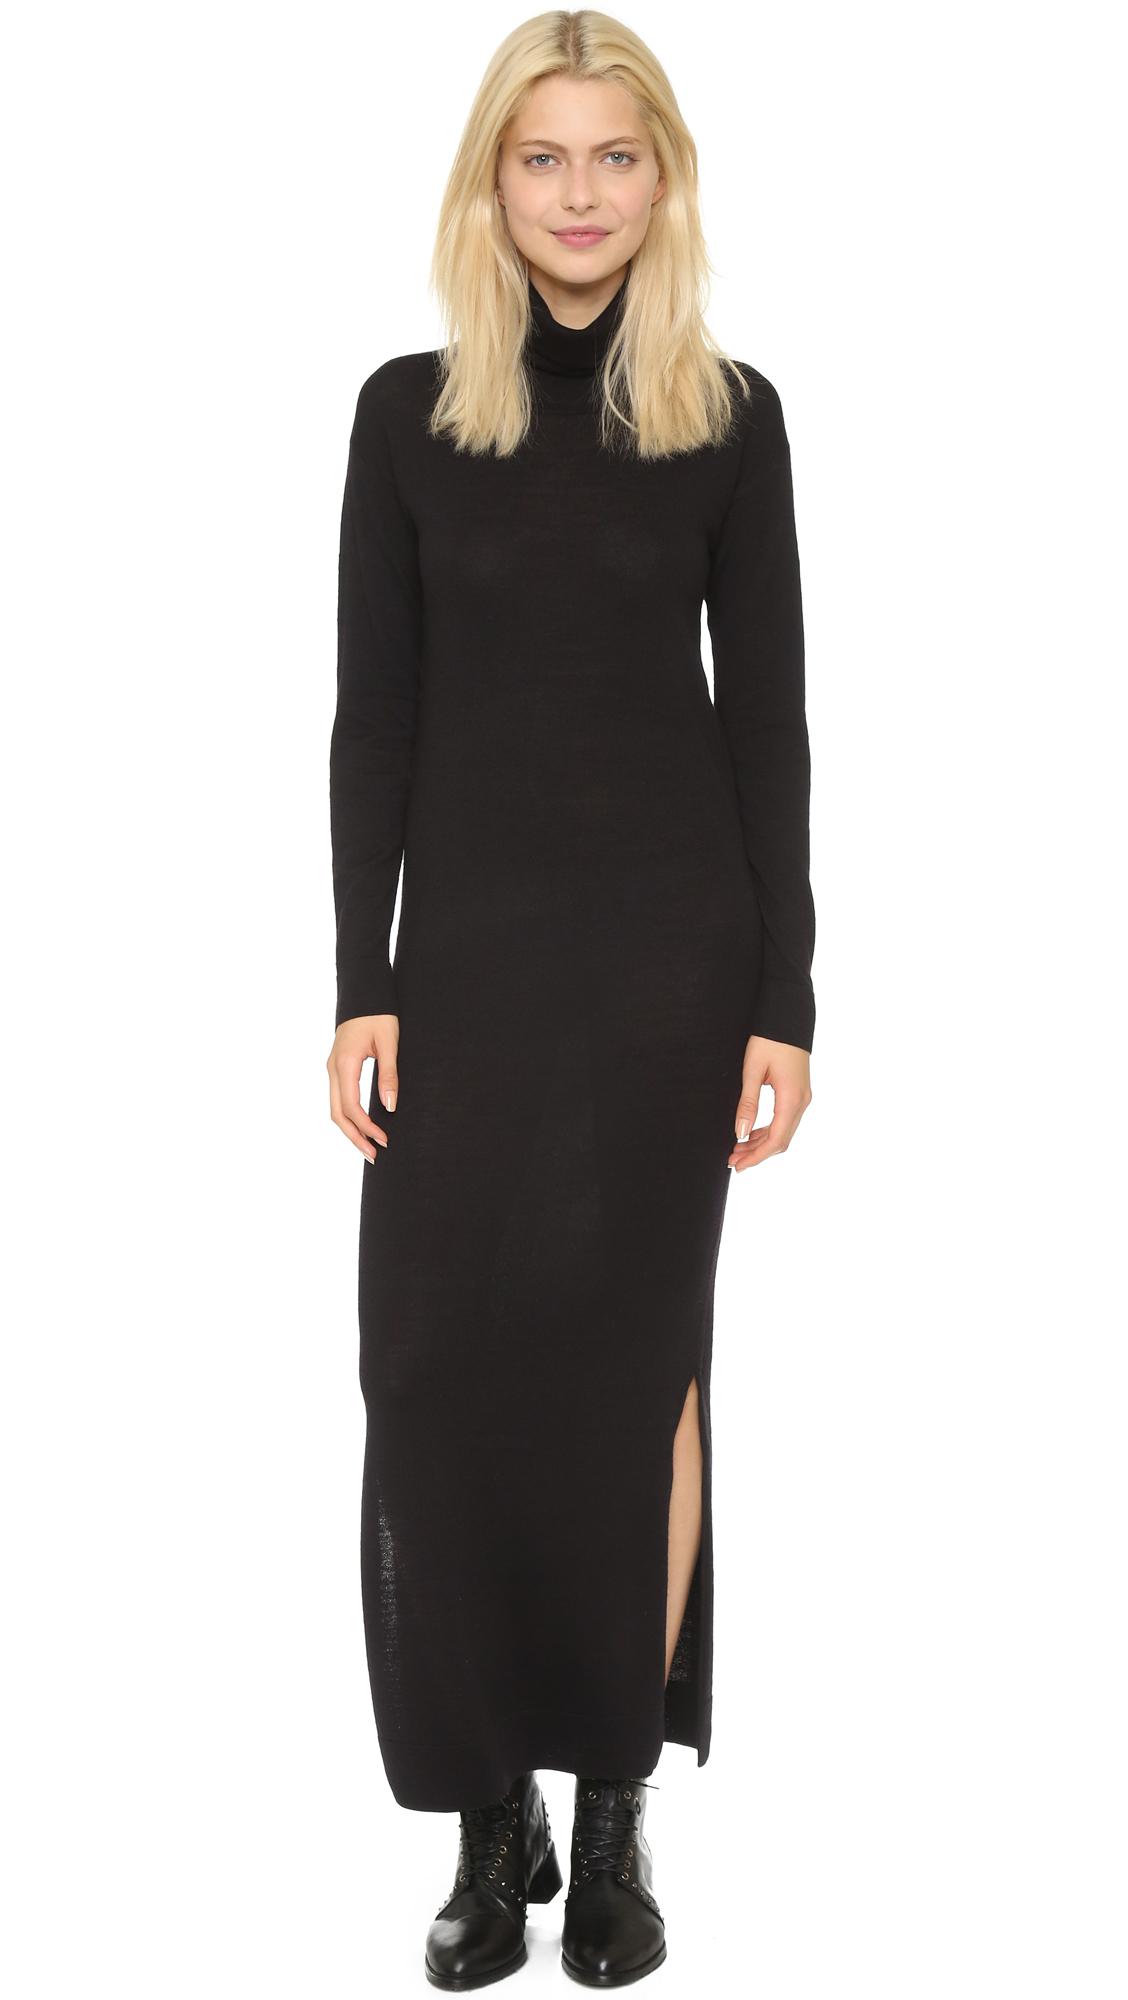 Black Sweater Maxi Dress - Sweater Vest